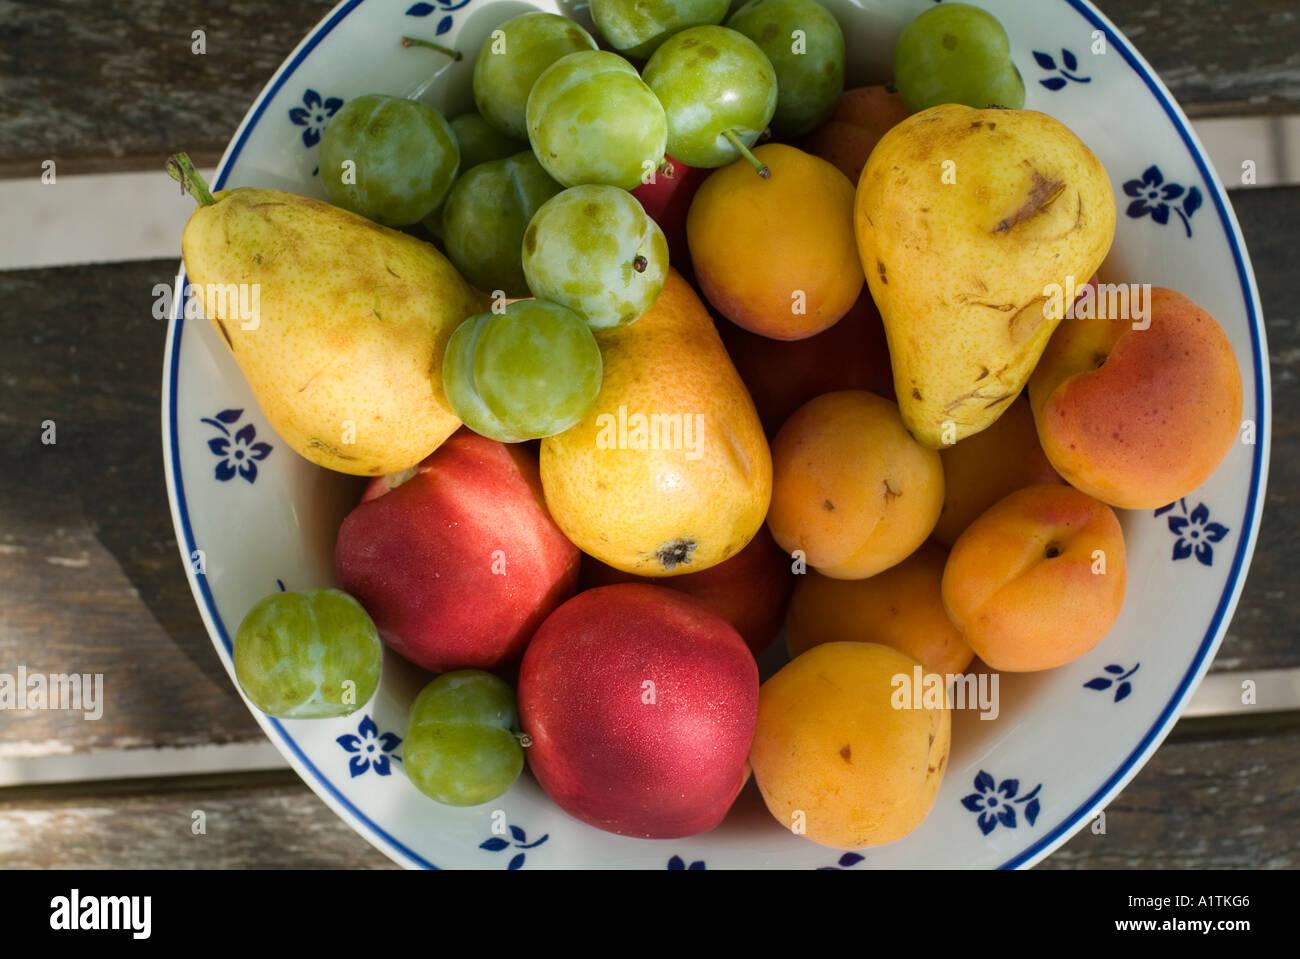 Summer fruit bowl - Stock Image